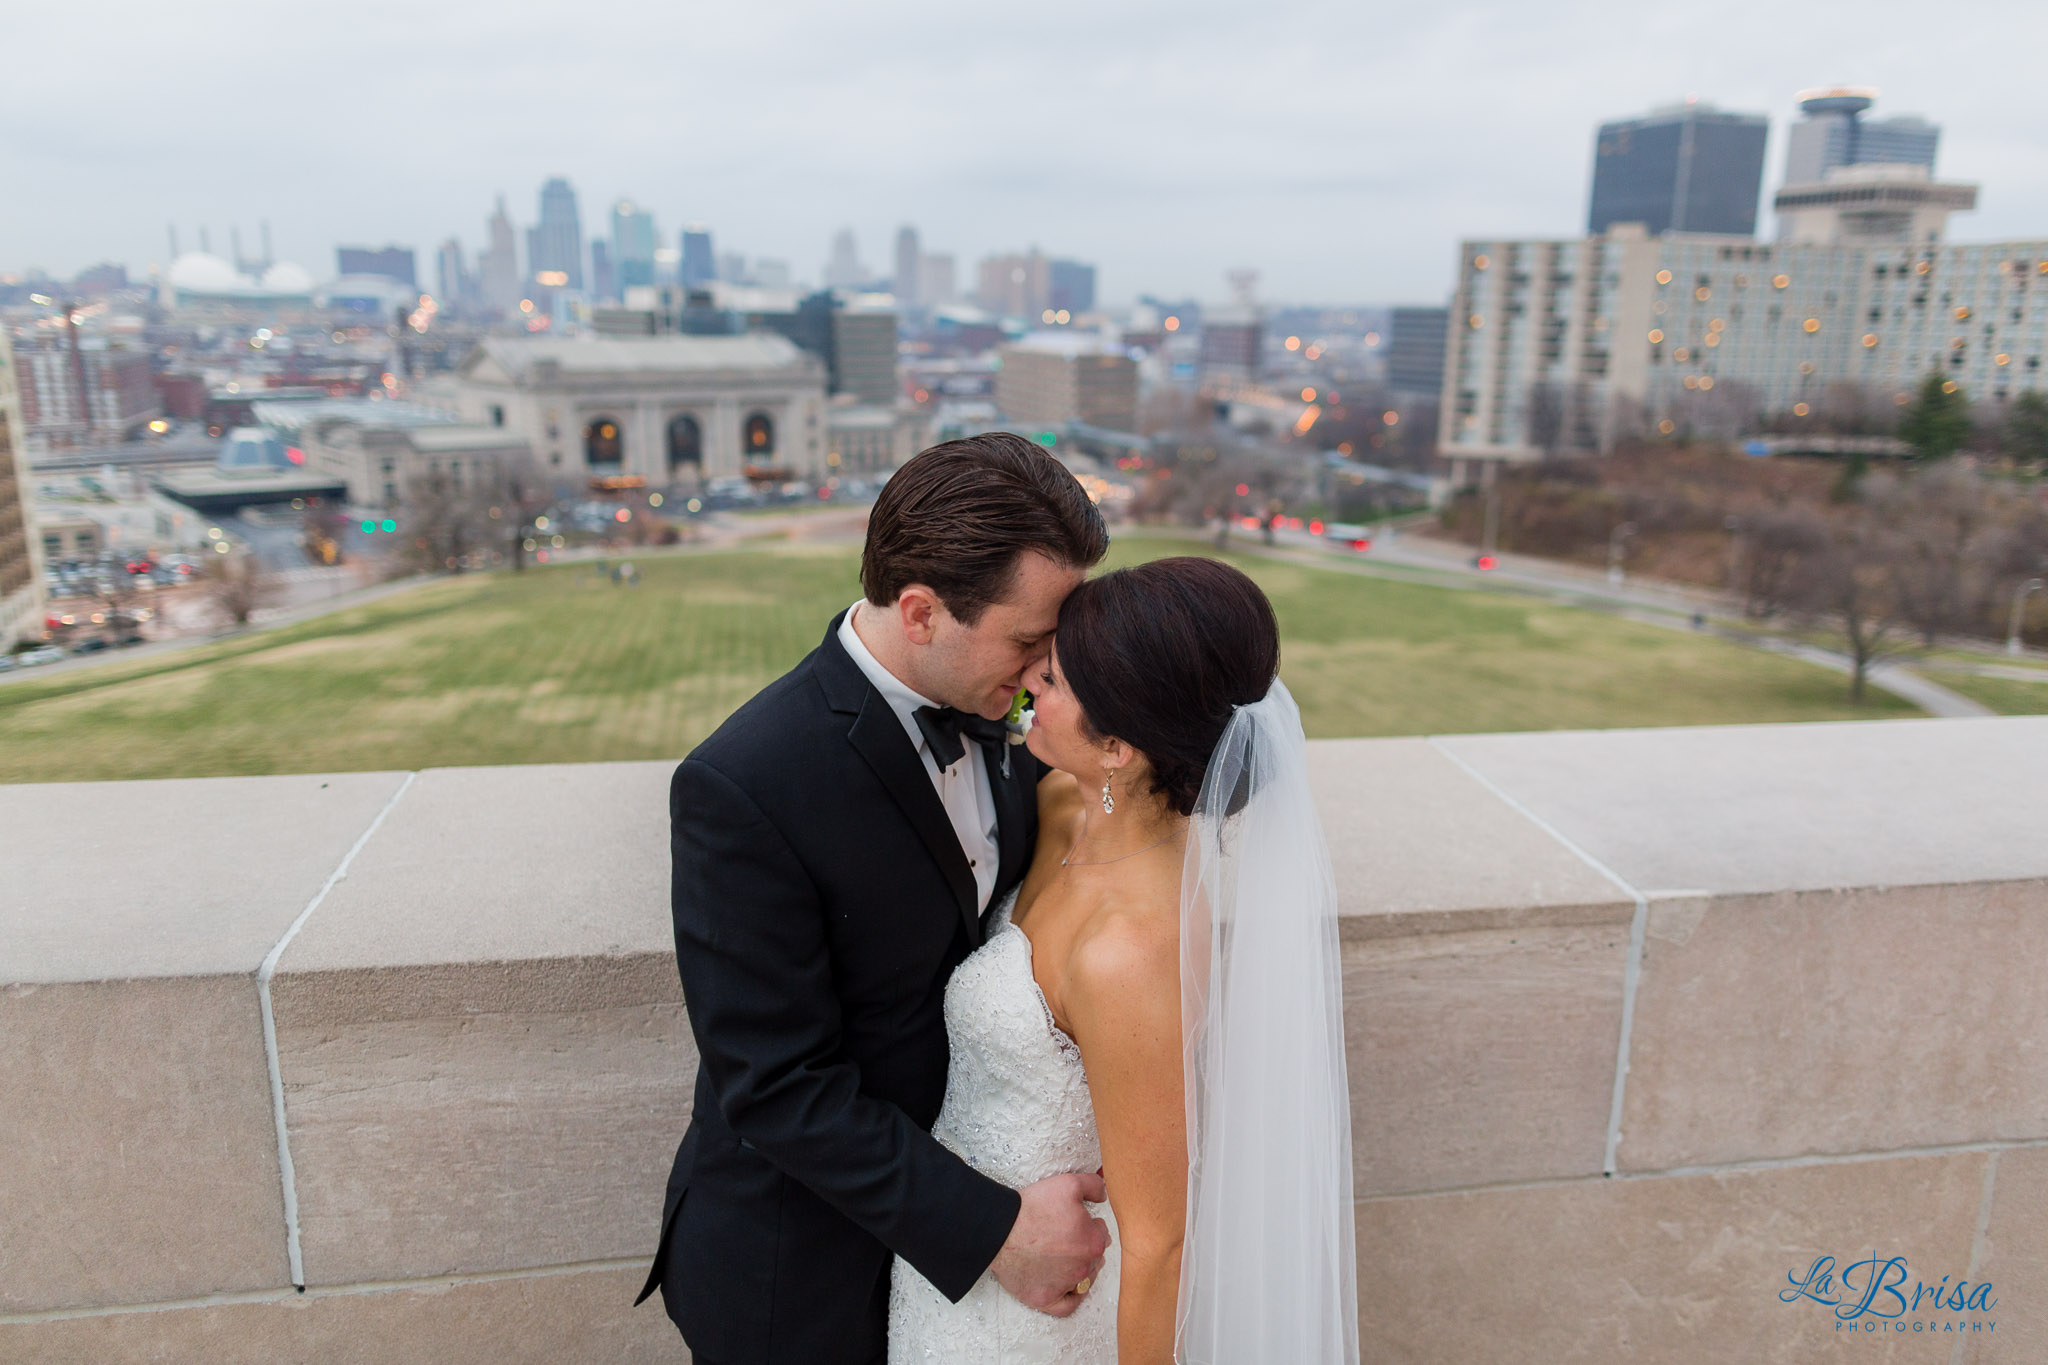 Kansas City Wedding Photography Chris Hsieh La Brisa Photographer